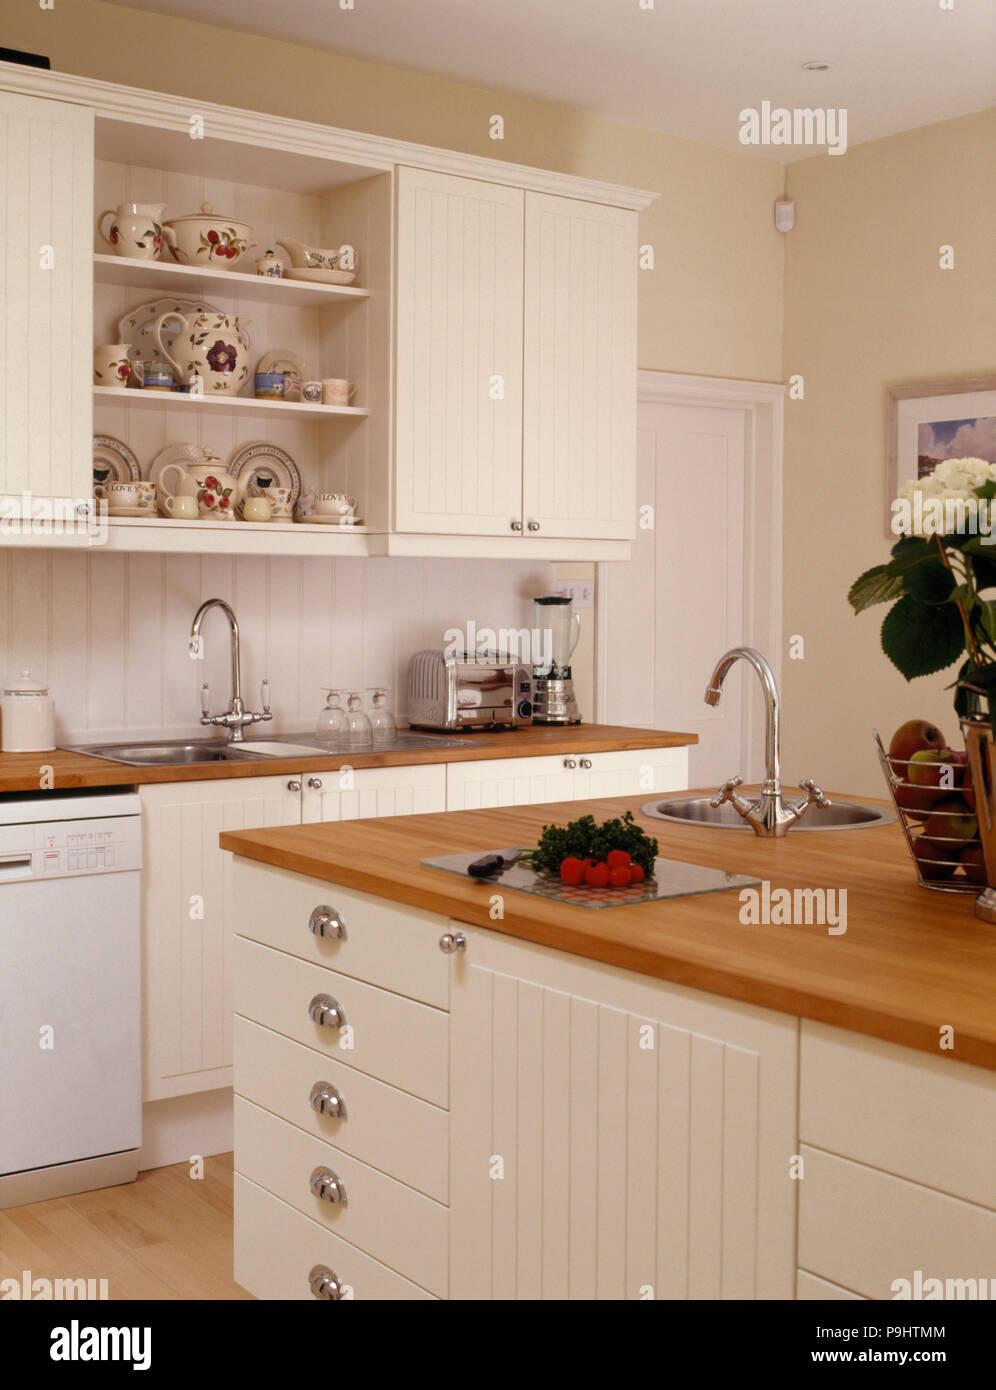 Interiors Kitchens Town Traditional Stockfotos & Interiors Kitchens ...